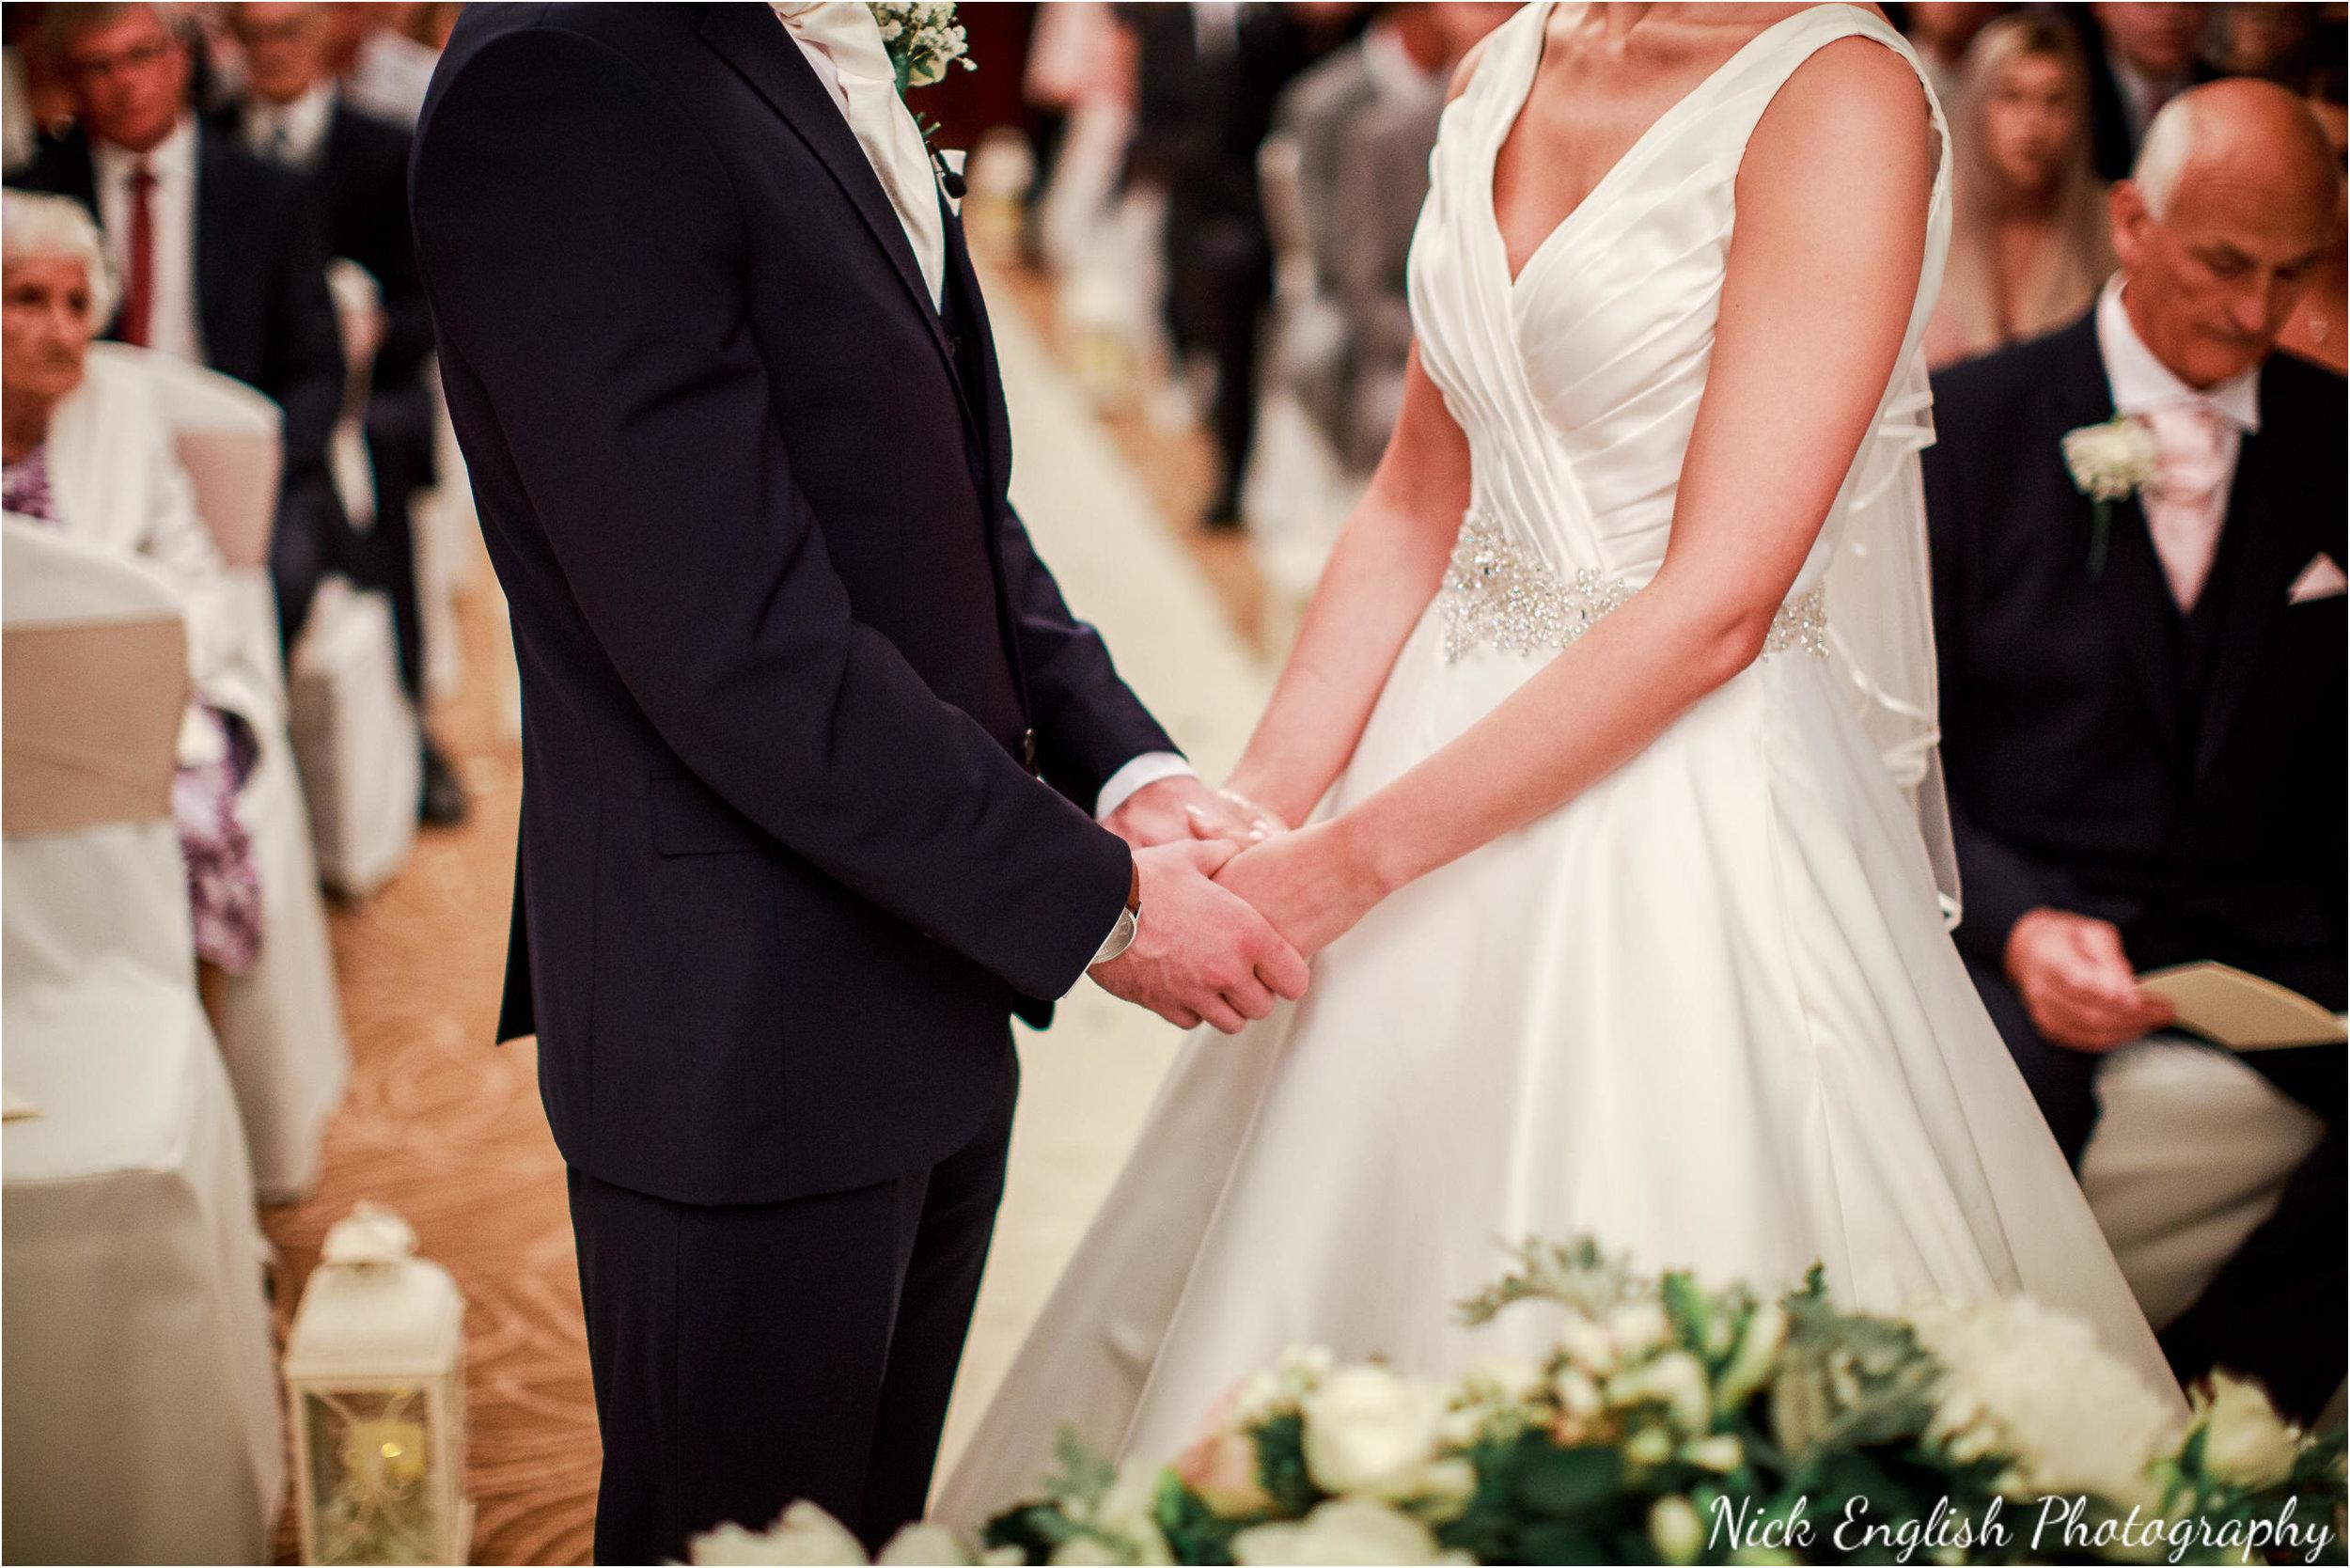 Emily David Wedding Photographs at Barton Grange Preston by Nick English Photography 62jpg.jpeg